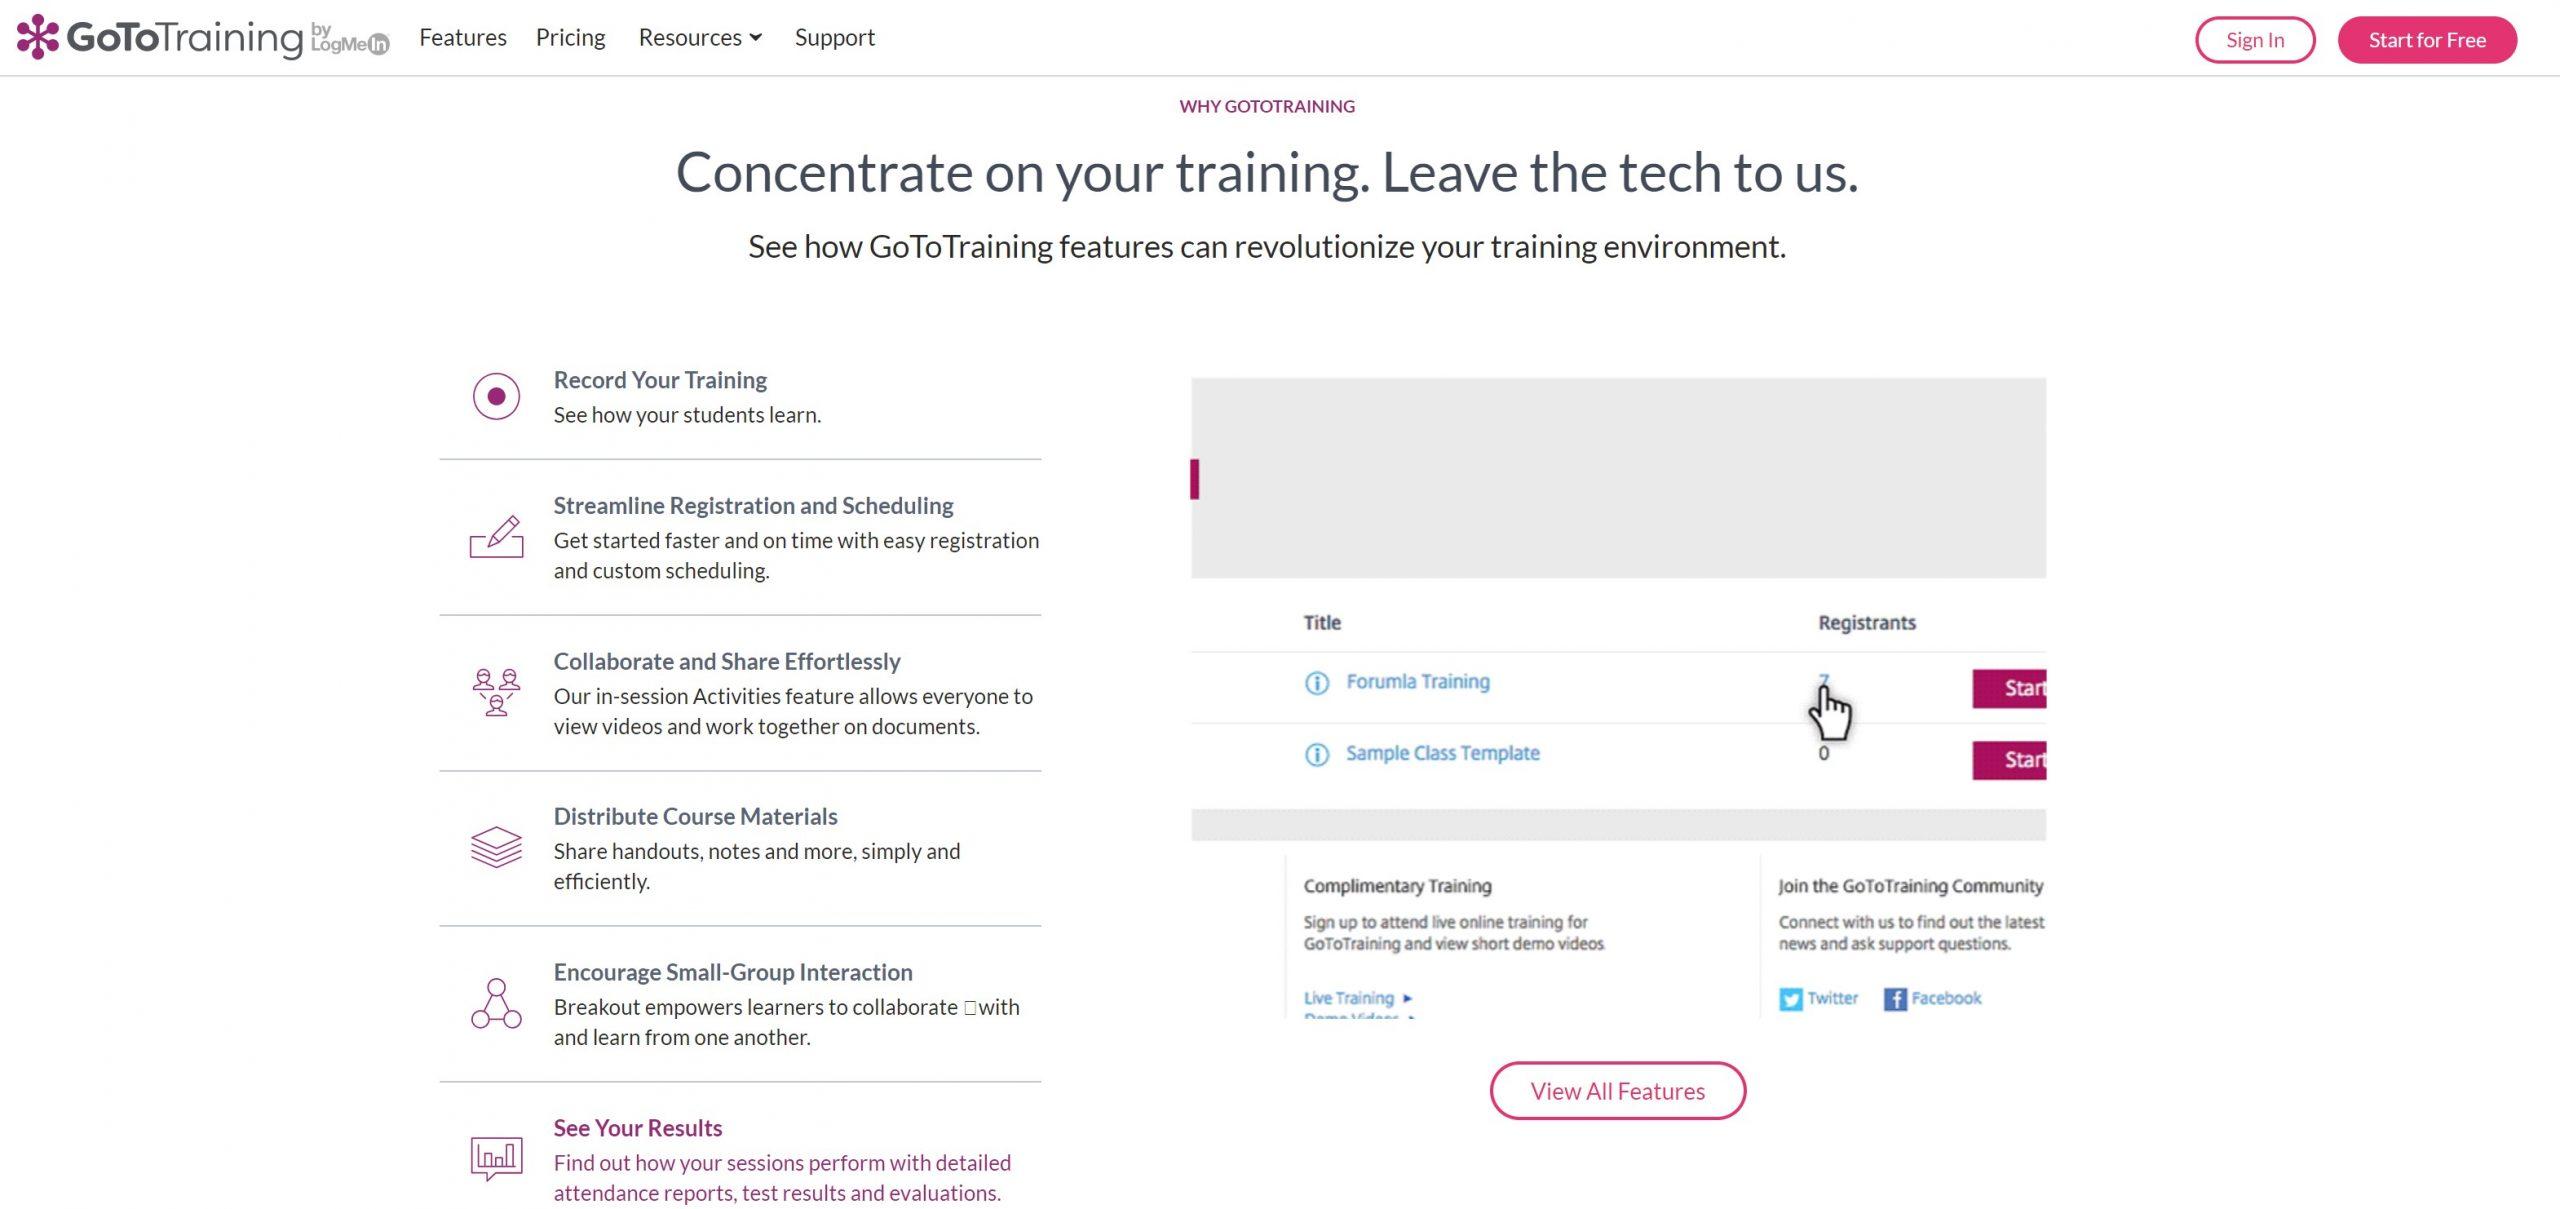 webinar online learning class room virtual solutions workshops